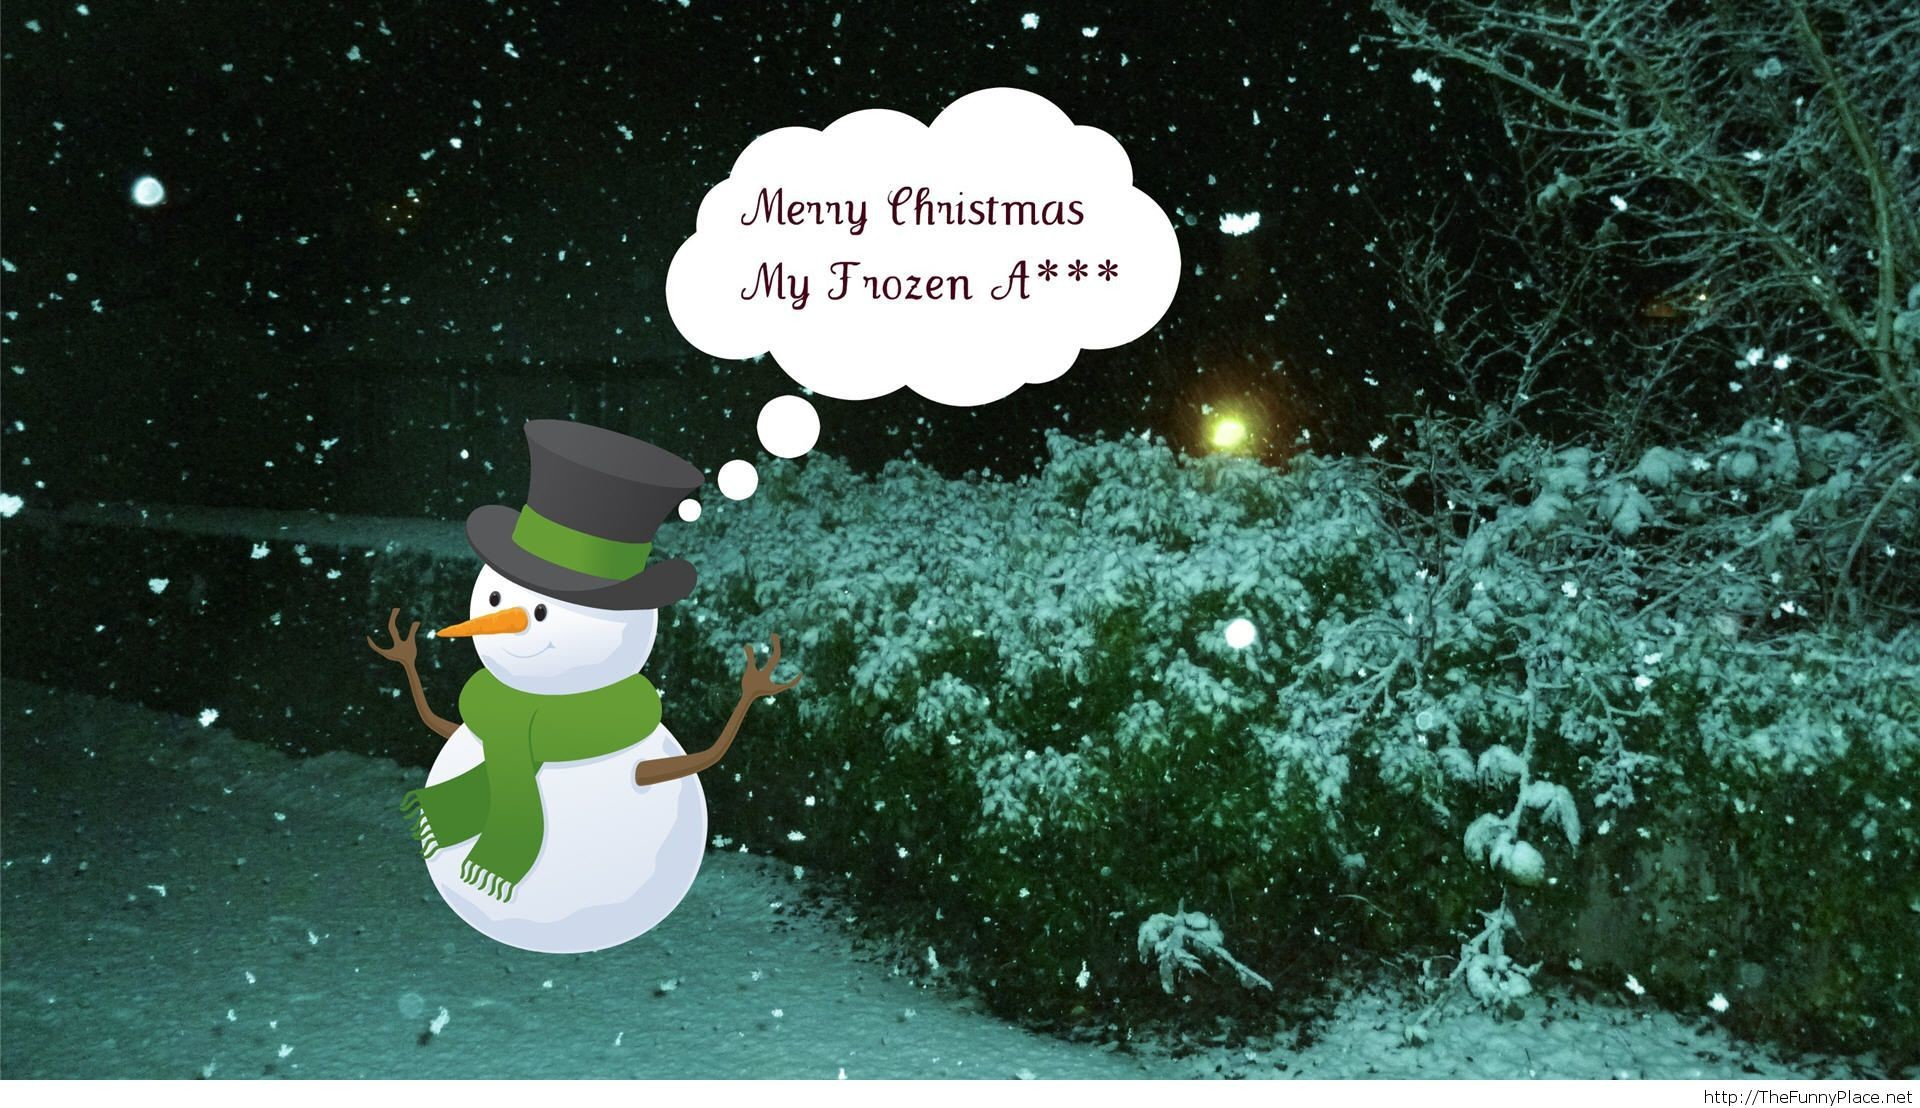 Funny Merry Christmas wallpaper